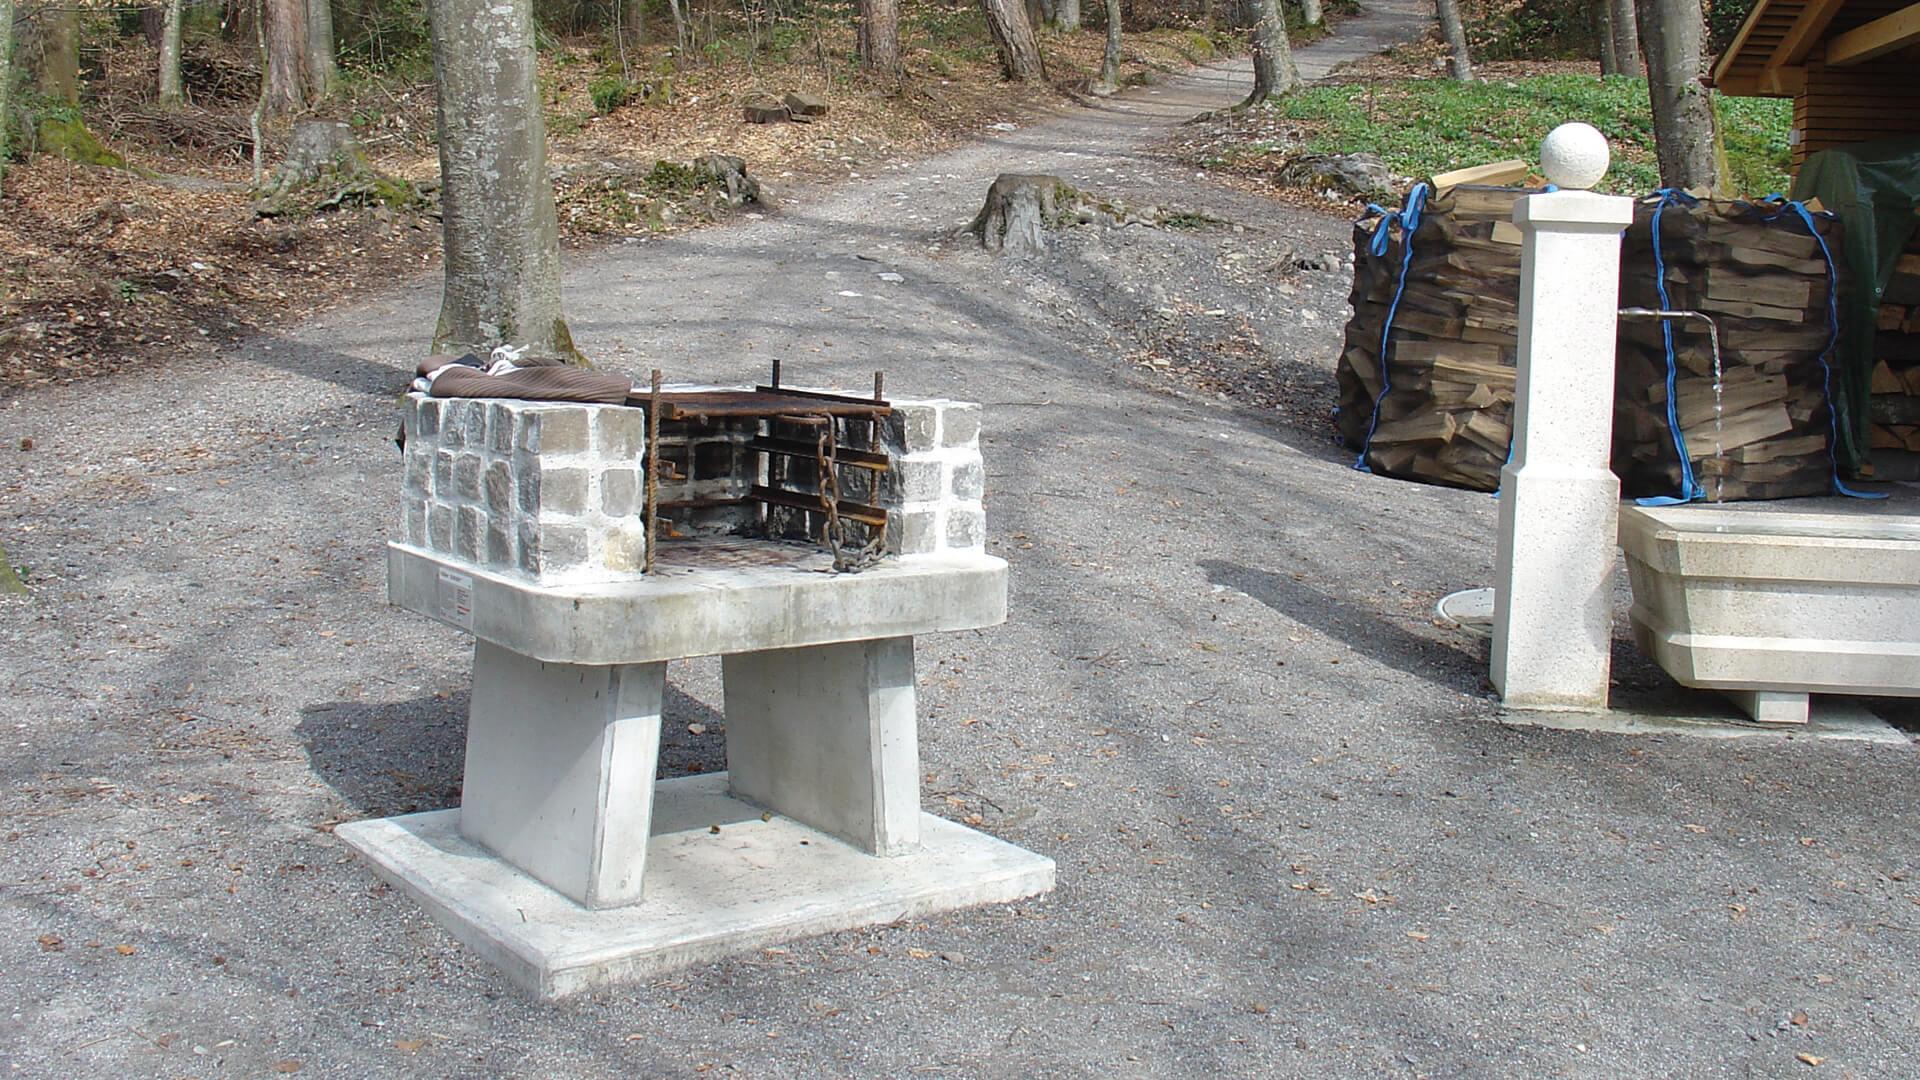 merligen-picknickplatz-opeten-fruehling-feuerstelle